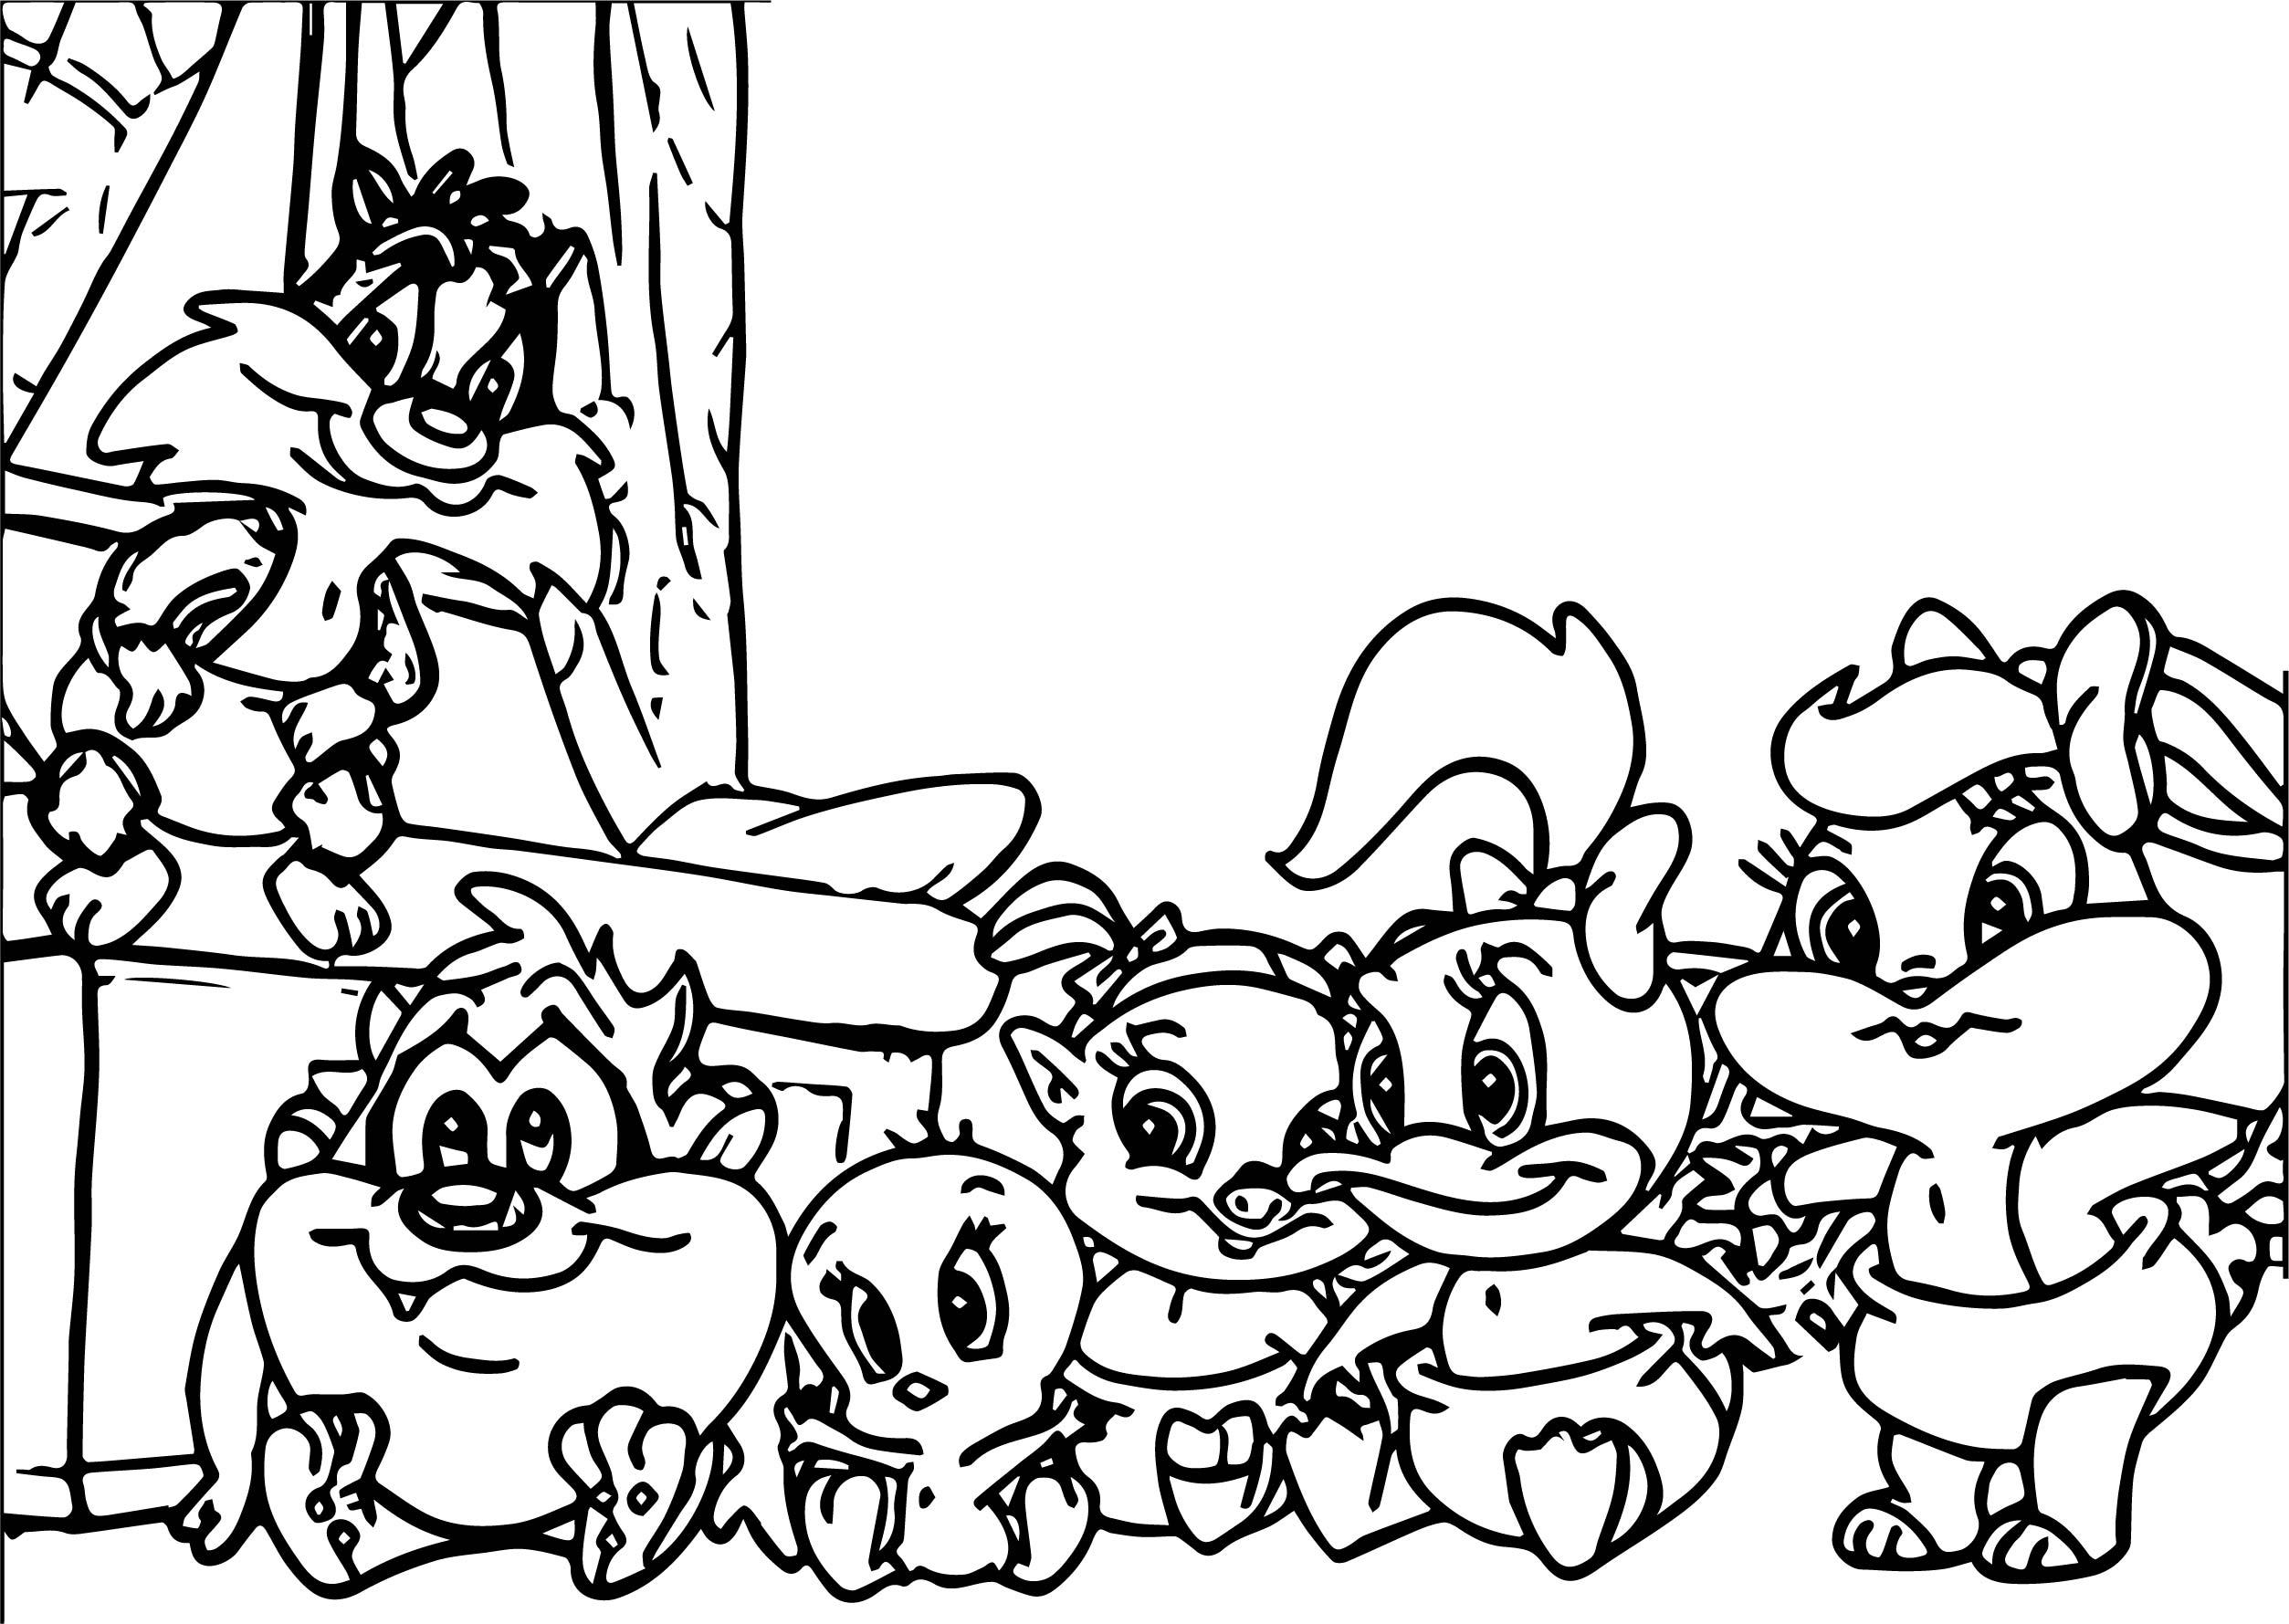 Warner Bros Baby Looney Tunes At Home Coloring Page